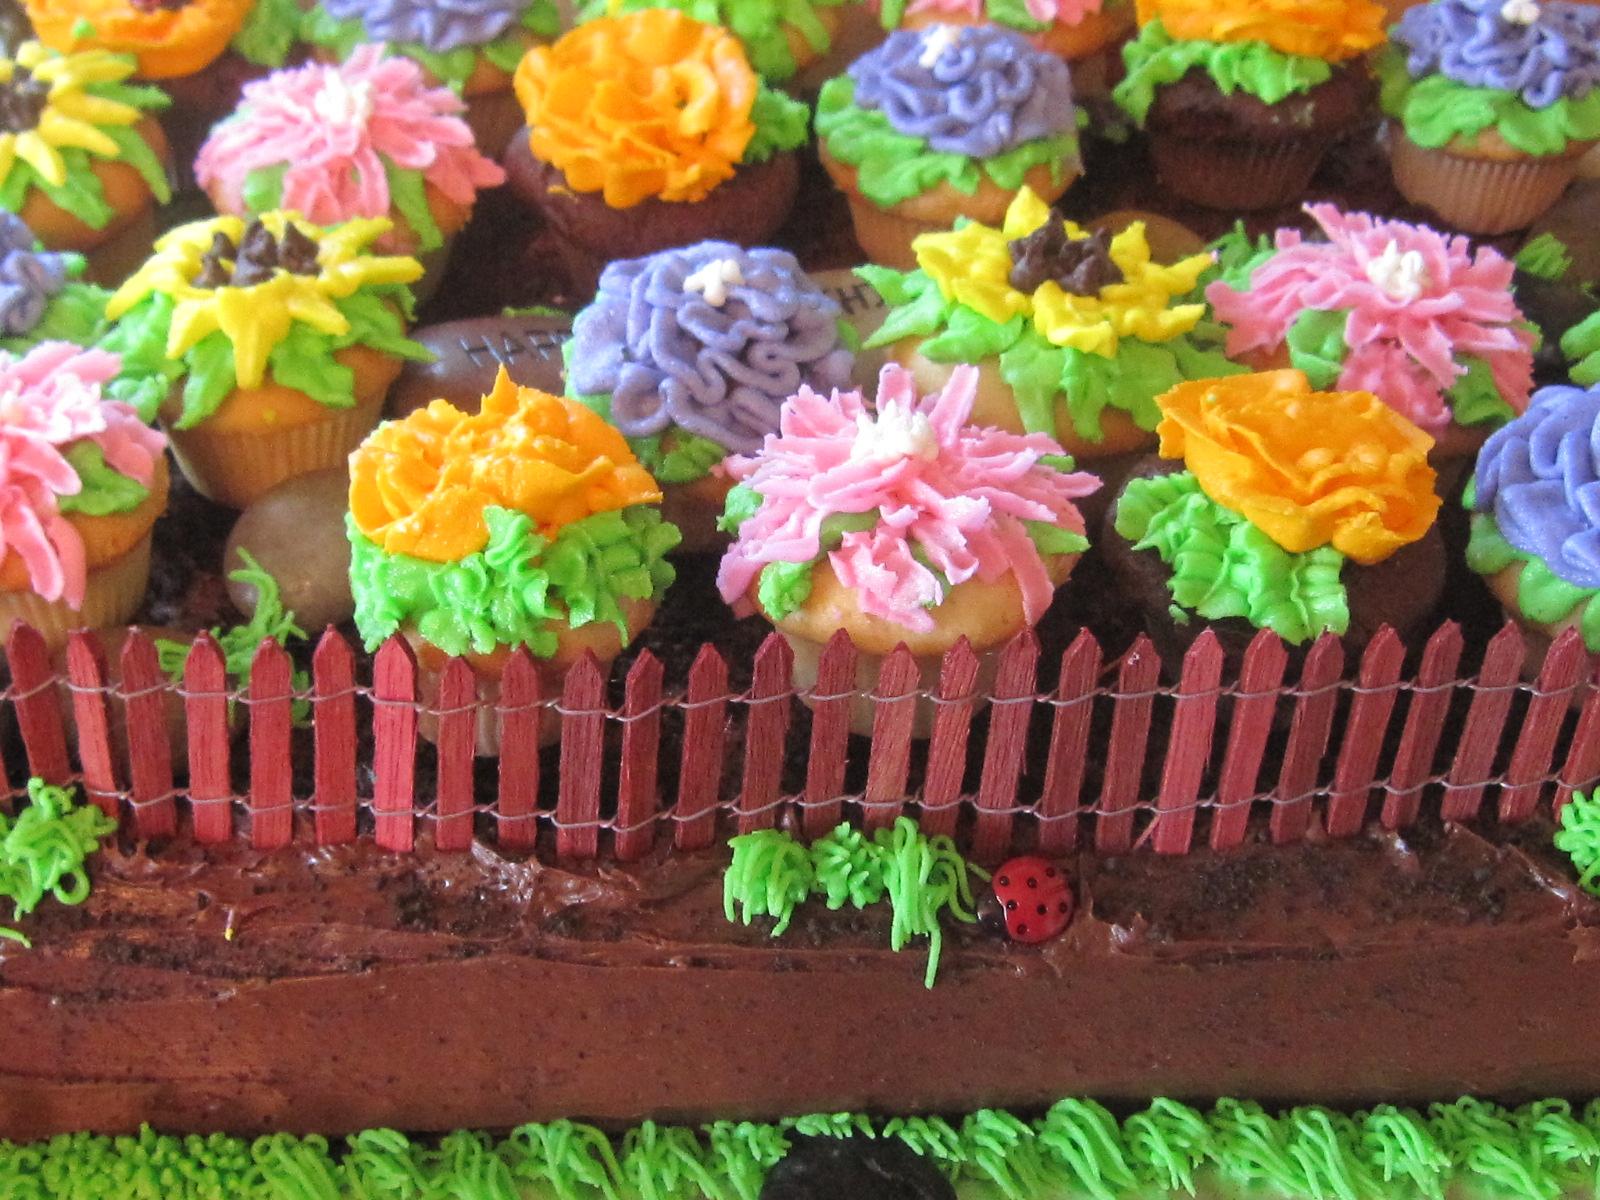 Loads of Luv From...: Flower Garden Birthday Cake